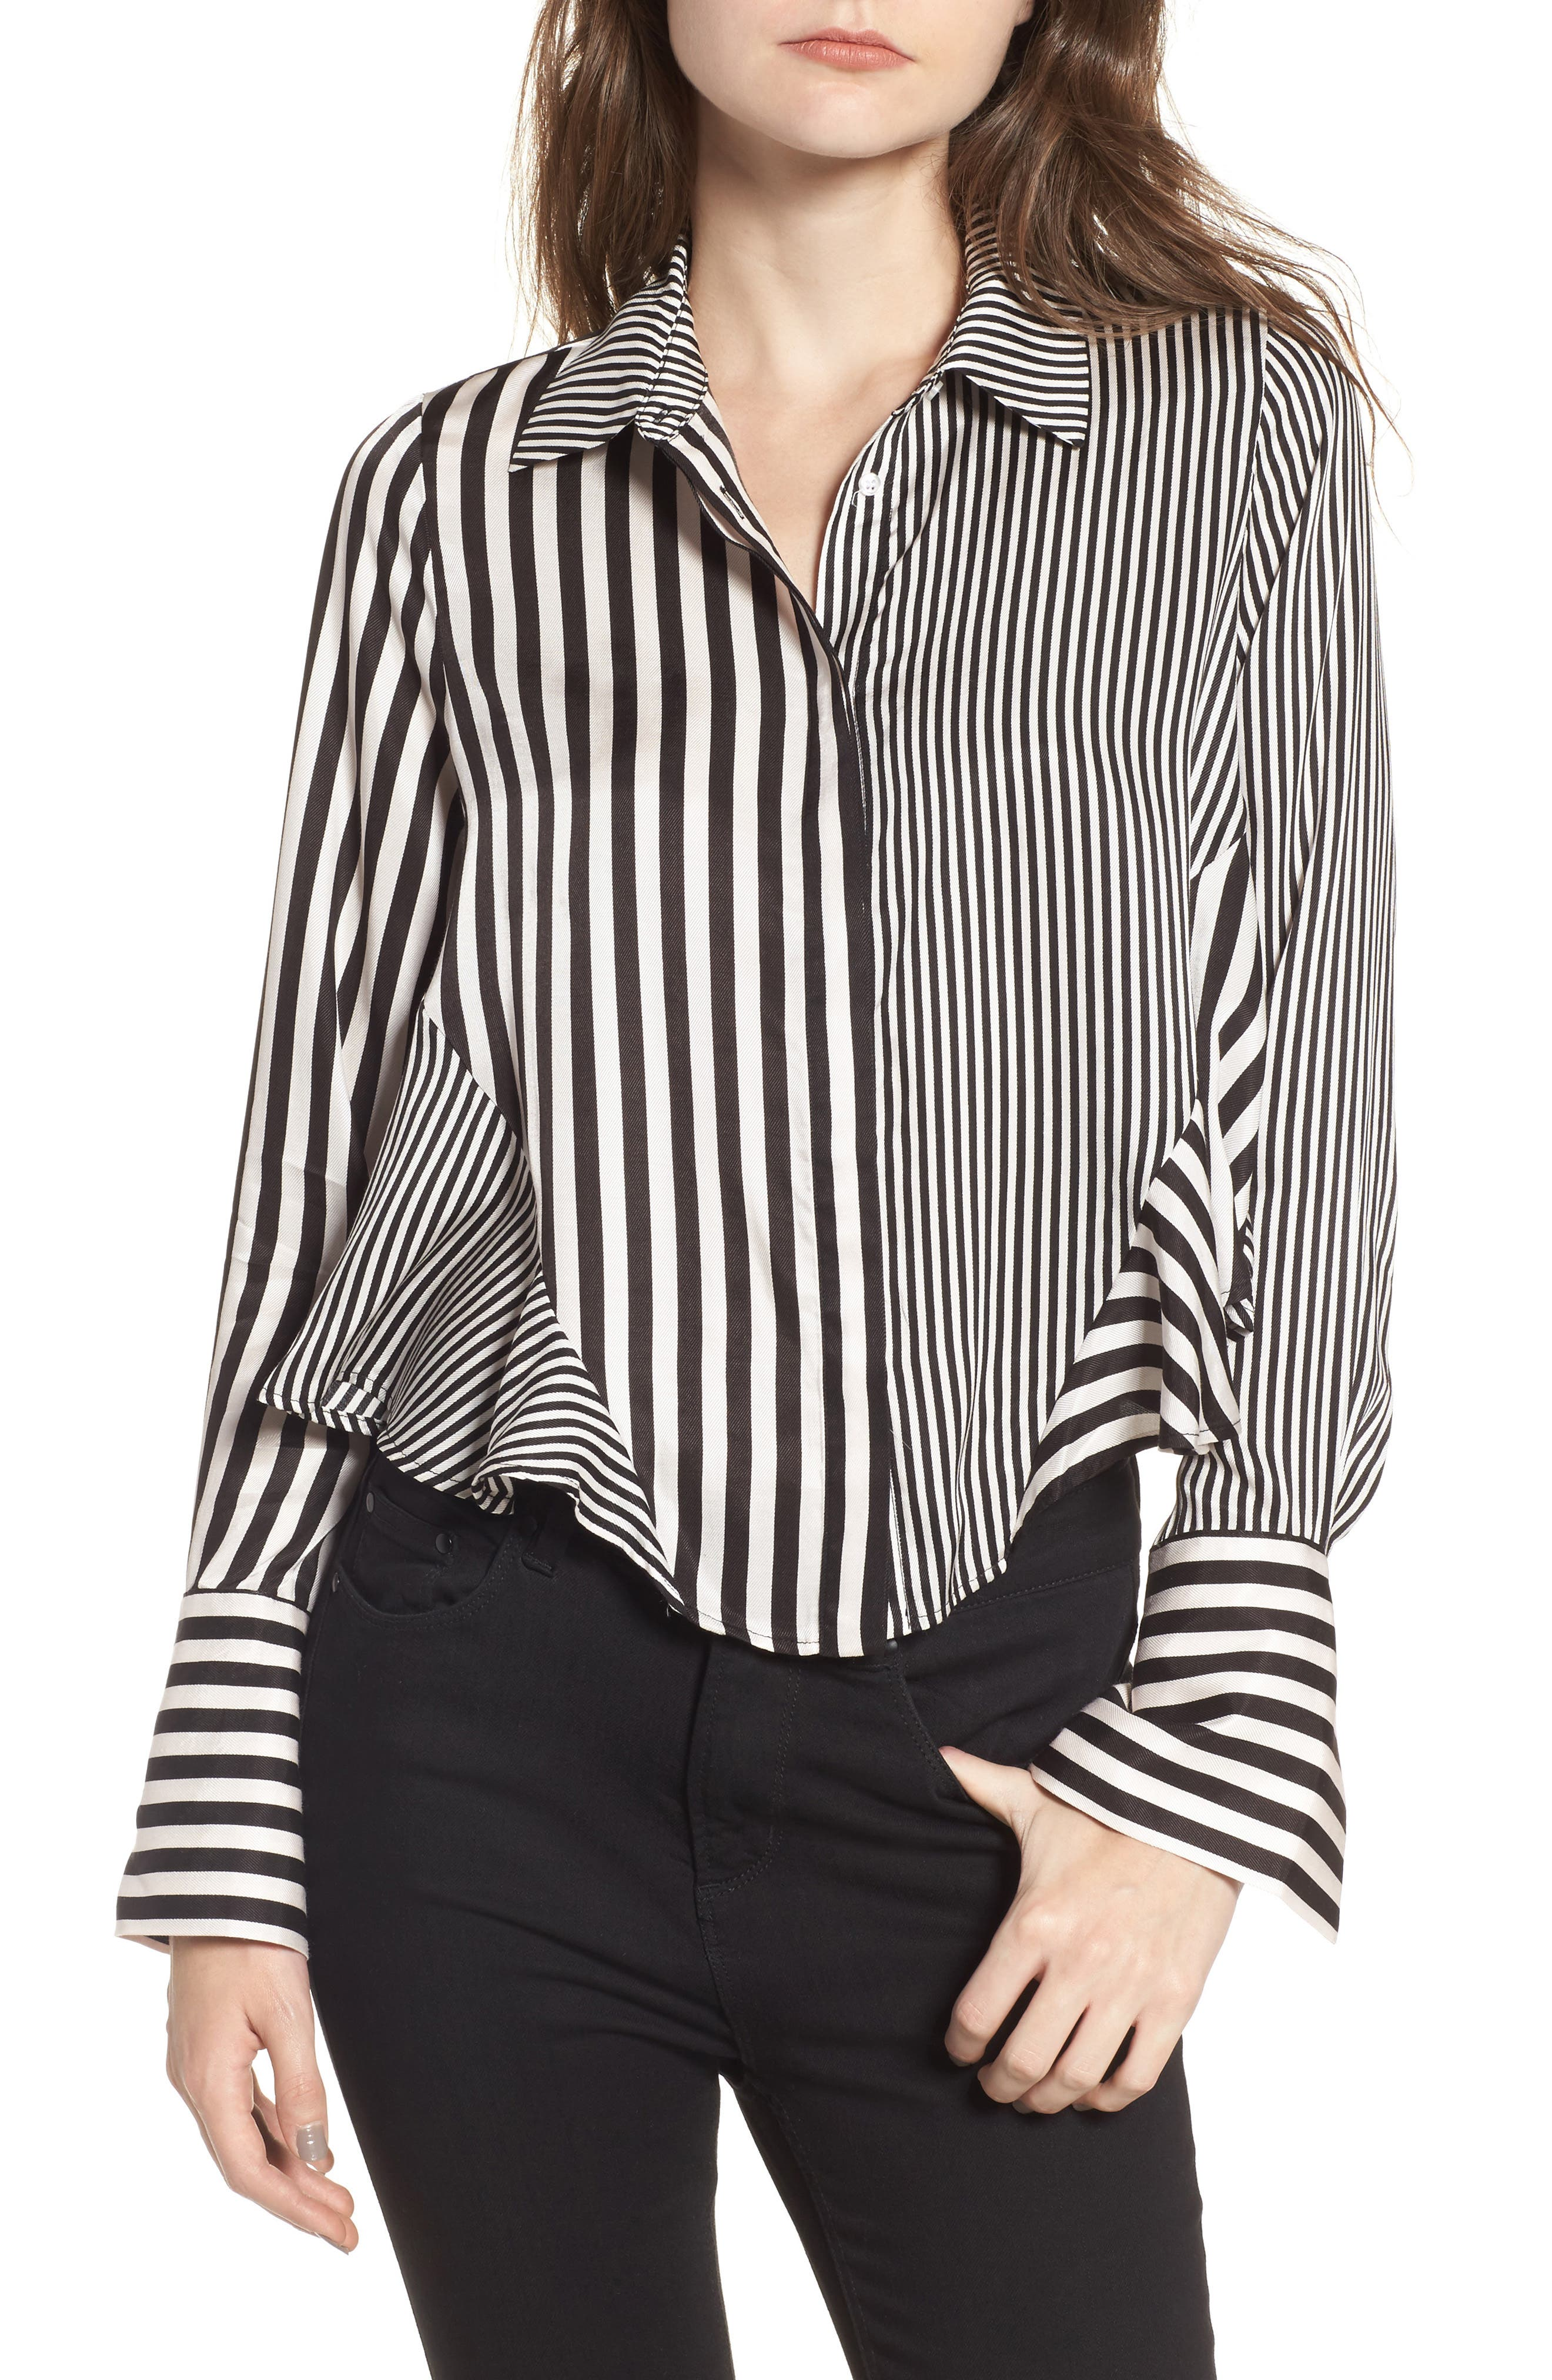 Alternate Image 1 Selected - AFRM Asher Crop Shirt